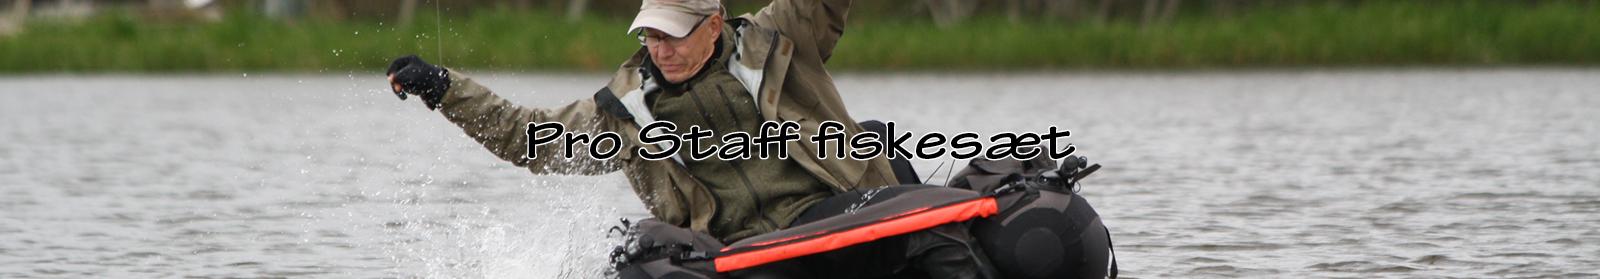 Pro Staff fiskegrej på LYSTFISKEREN.dk